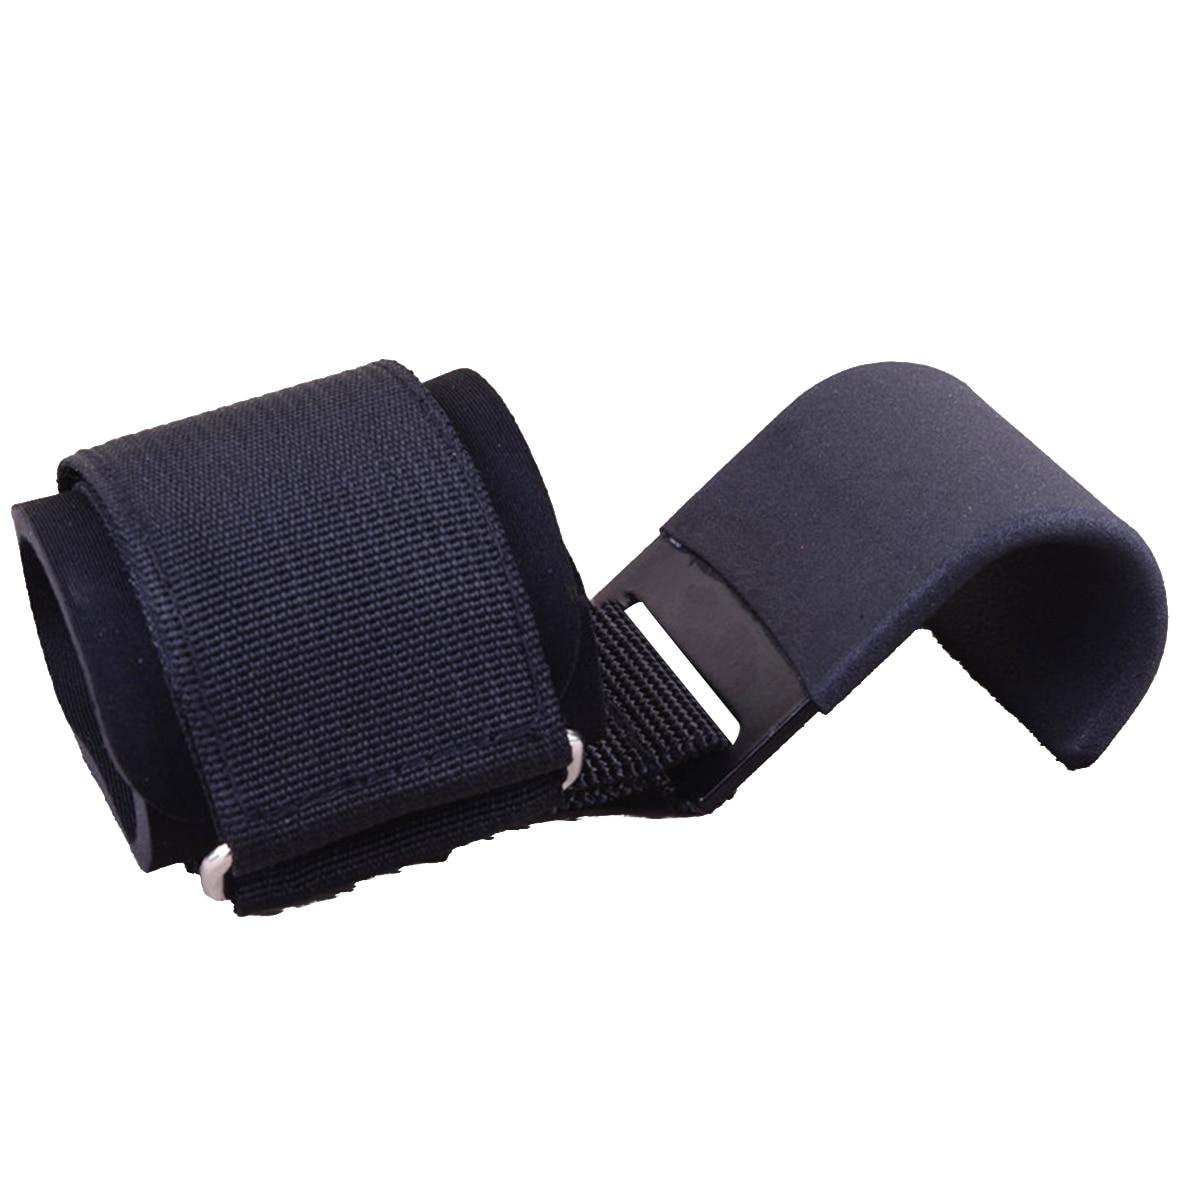 Adulto 1 Par Ajustável Anti-Slip Guarda Pulso